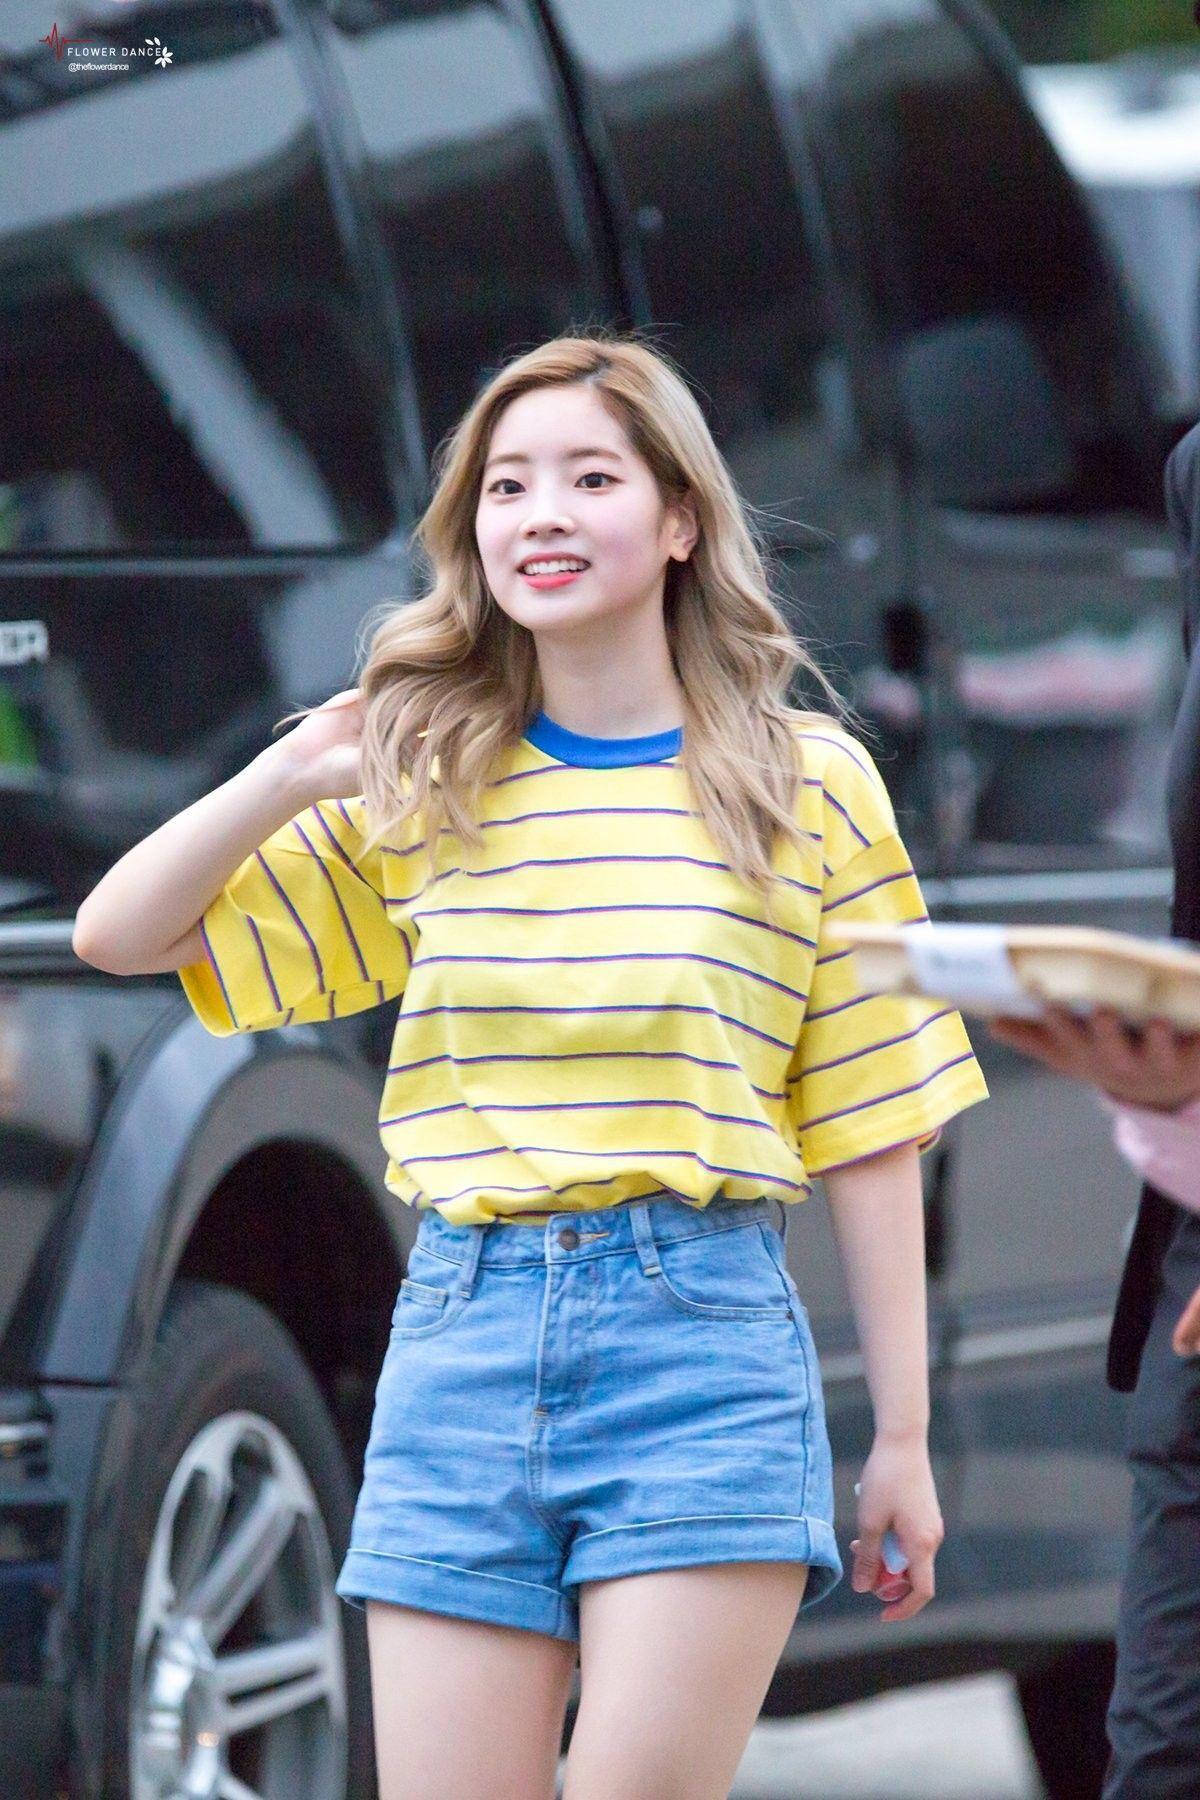 Twice S Dahyun Fashion Kpop Idol Kpopfashion Twice S Dahyun Fashion Kpop Idol Airport Fashion Kpop Kpop Outfits Kpop Fashion